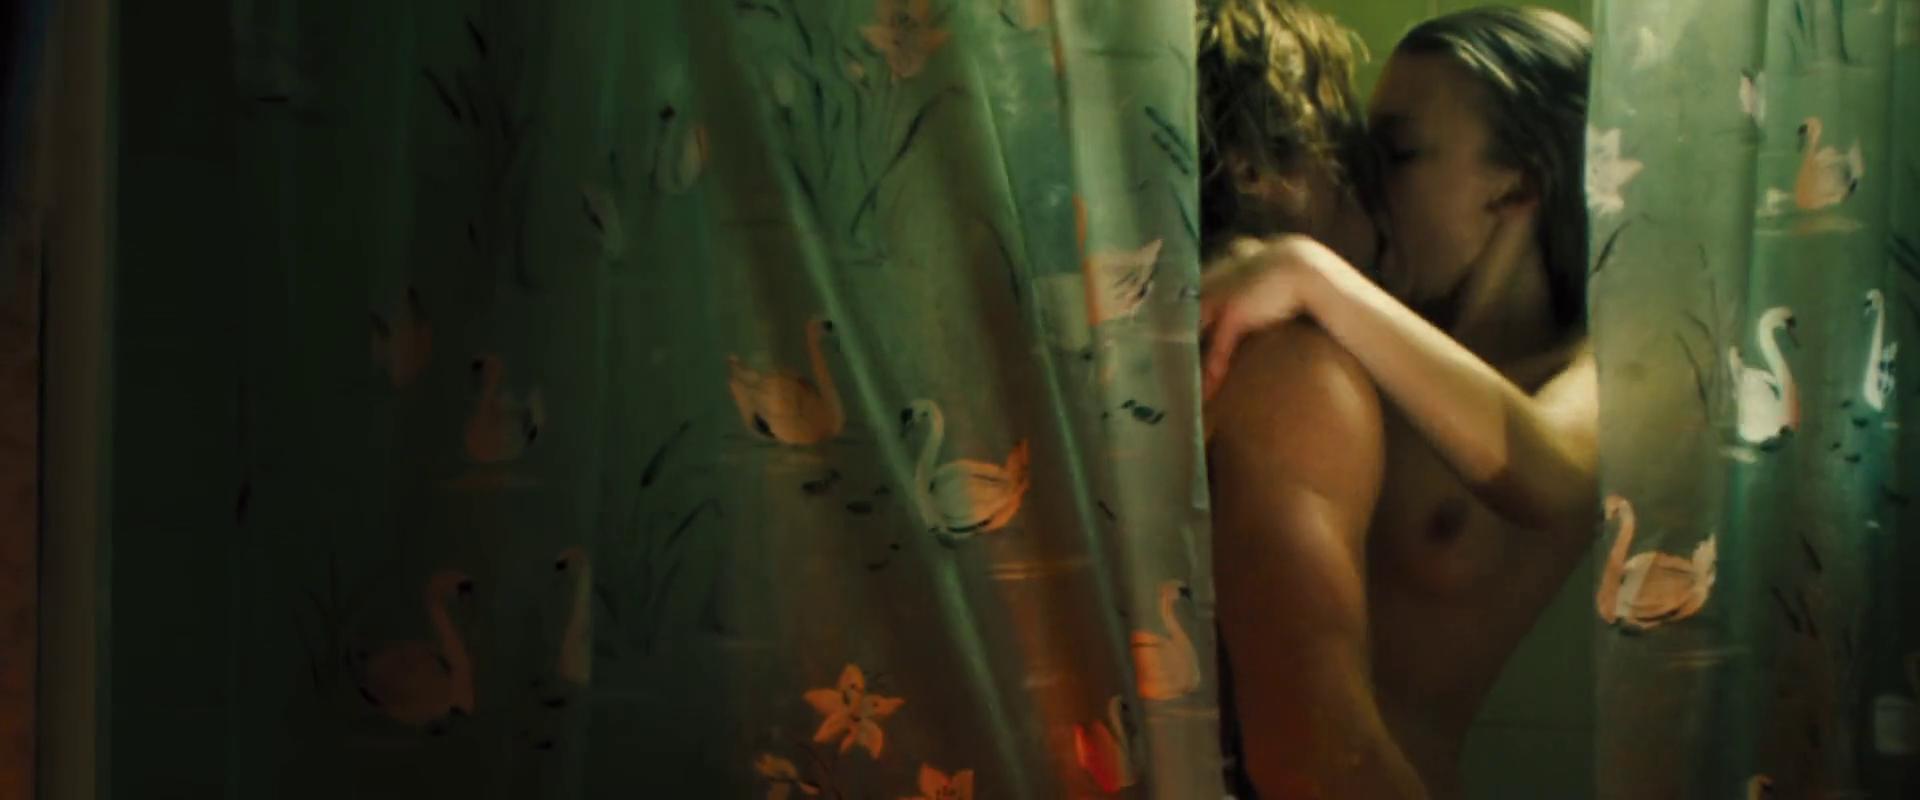 Natalie Dormer películas